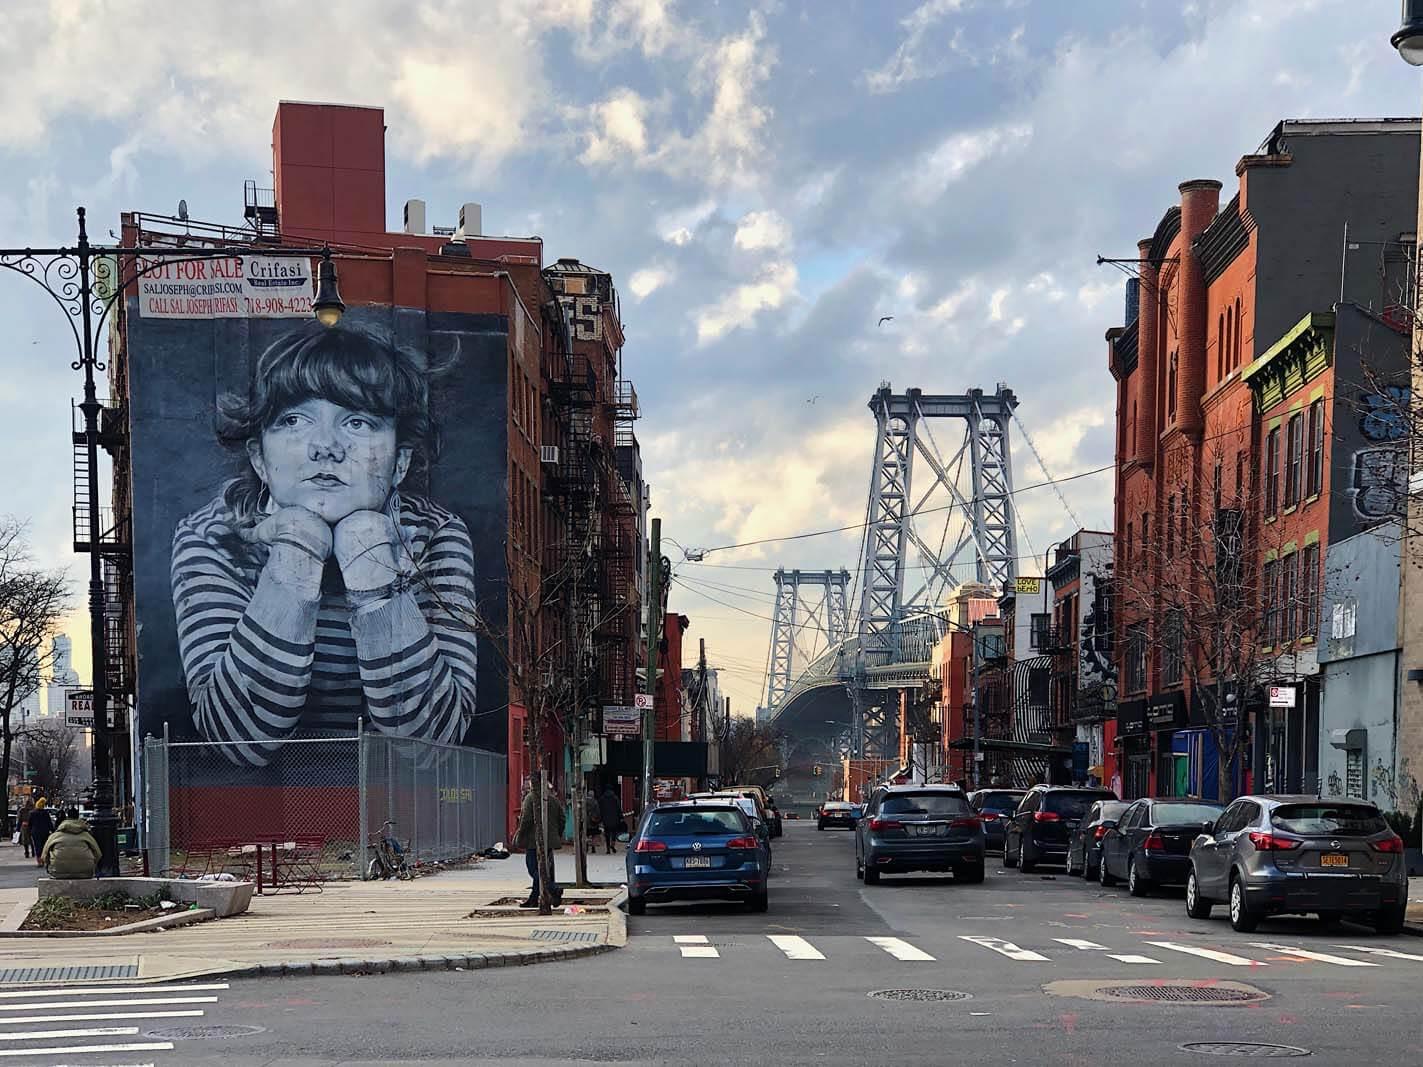 Mona Lisa of Williamsburg by Steven Paul Brooklyn mural and bridge